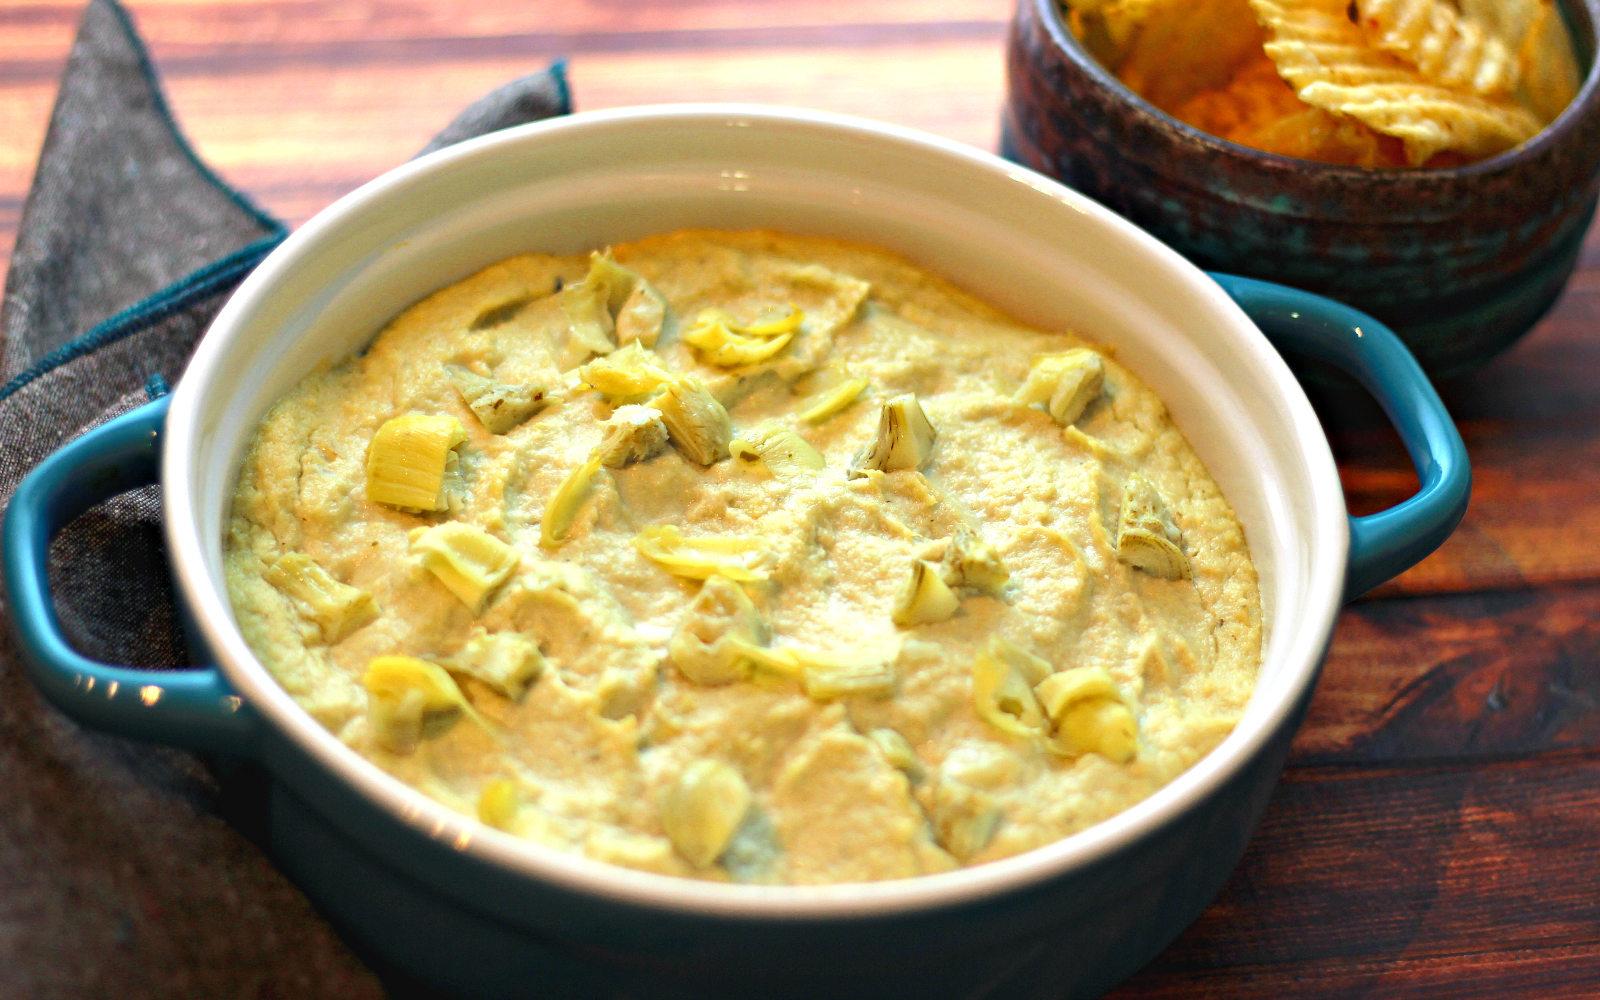 Lemon Artichoke Dip [Vegan, Gluten-Free]   One Green Planet